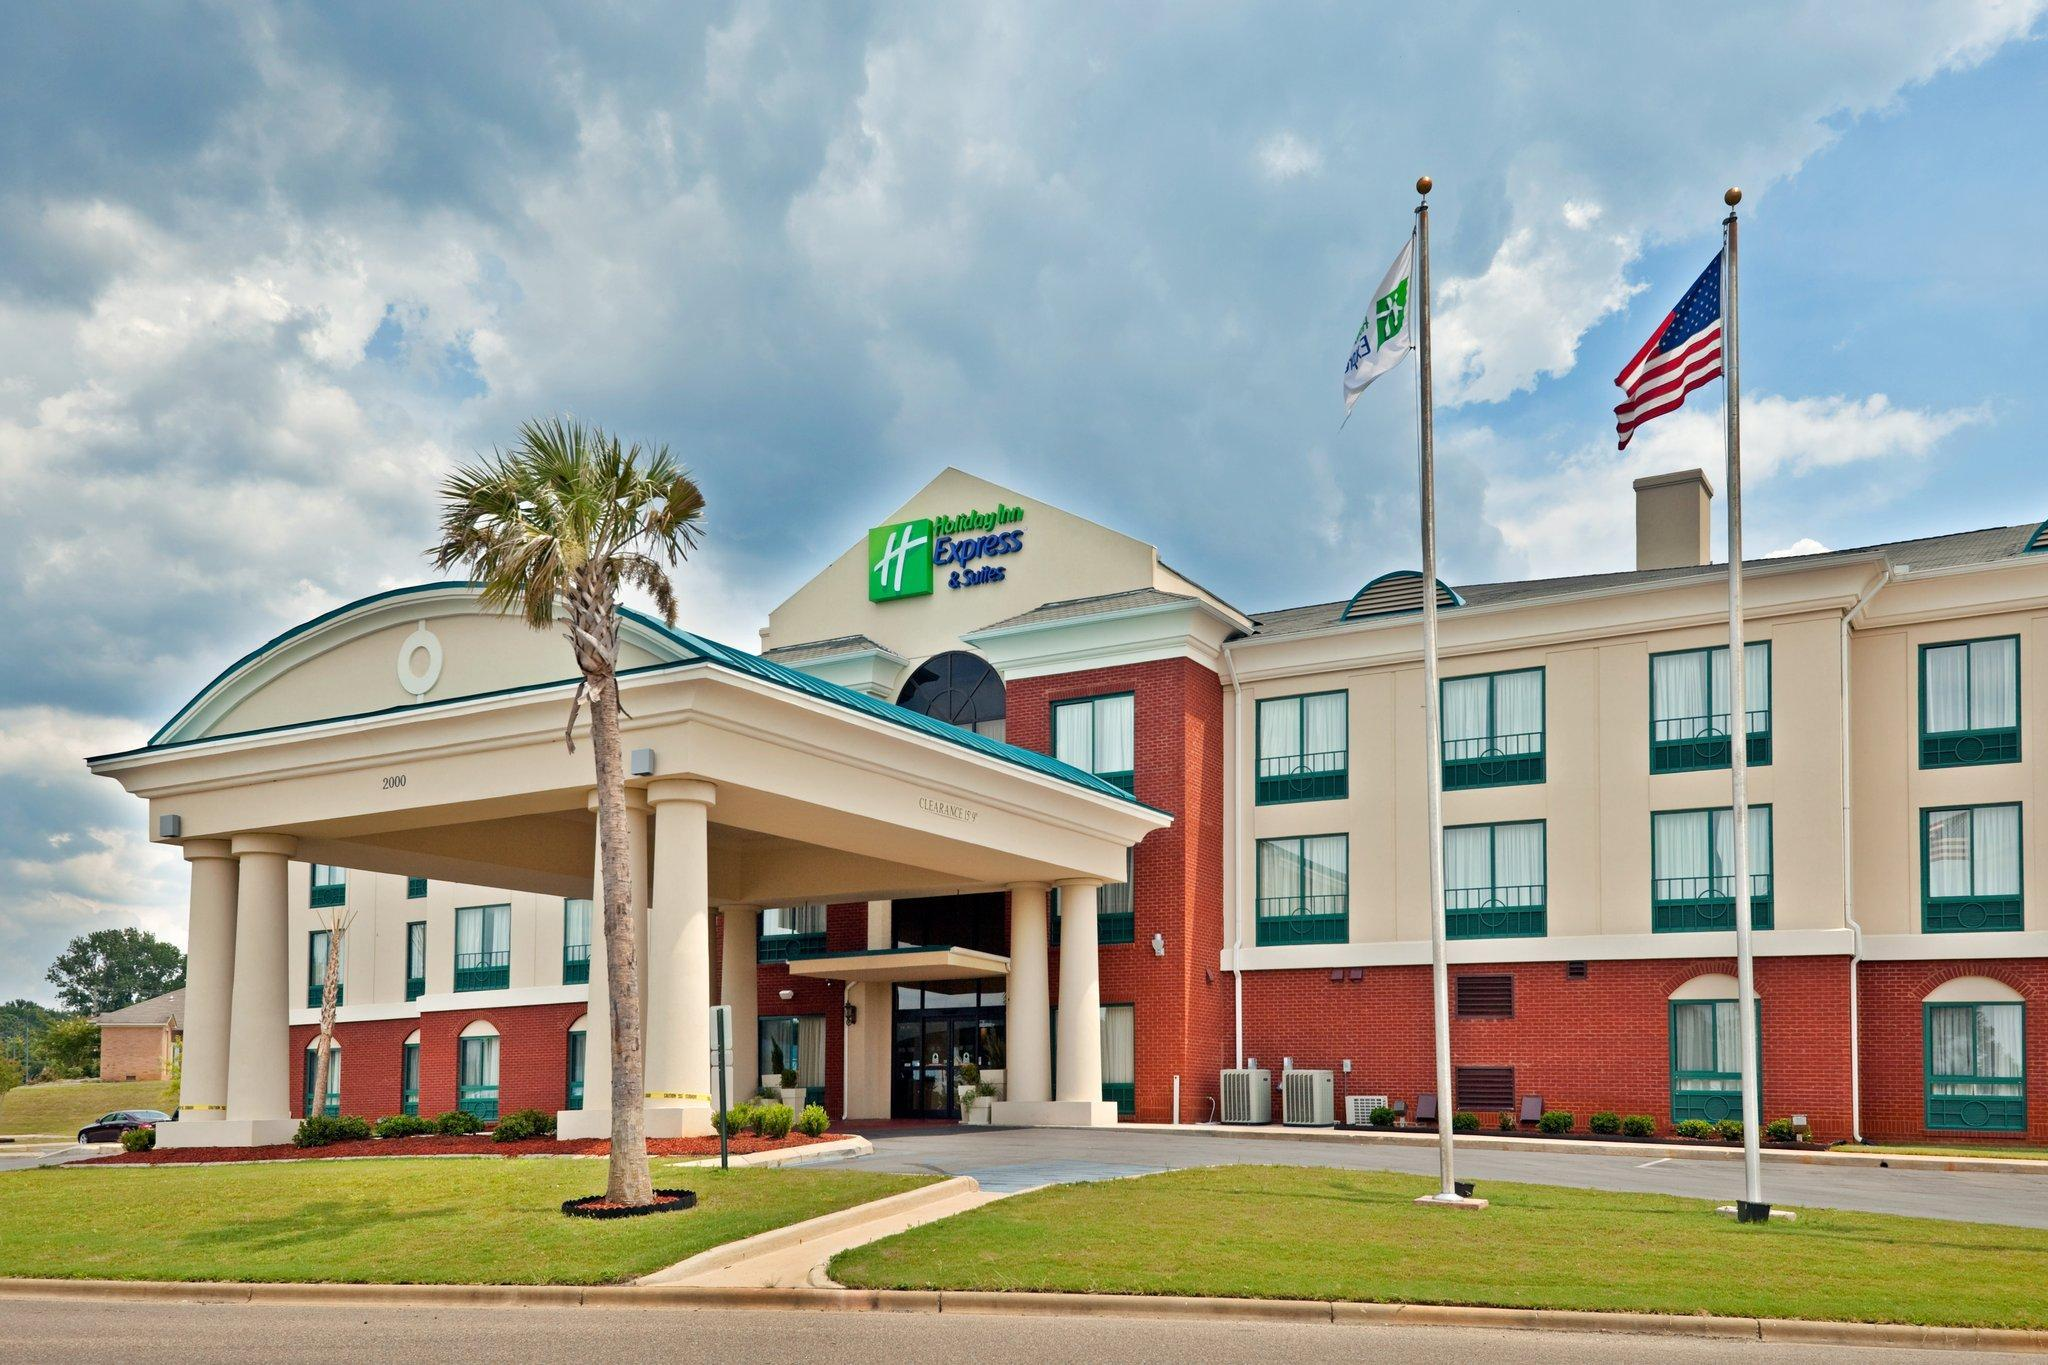 Holiday Inn Express Hotel & Suites Selma, Dallas